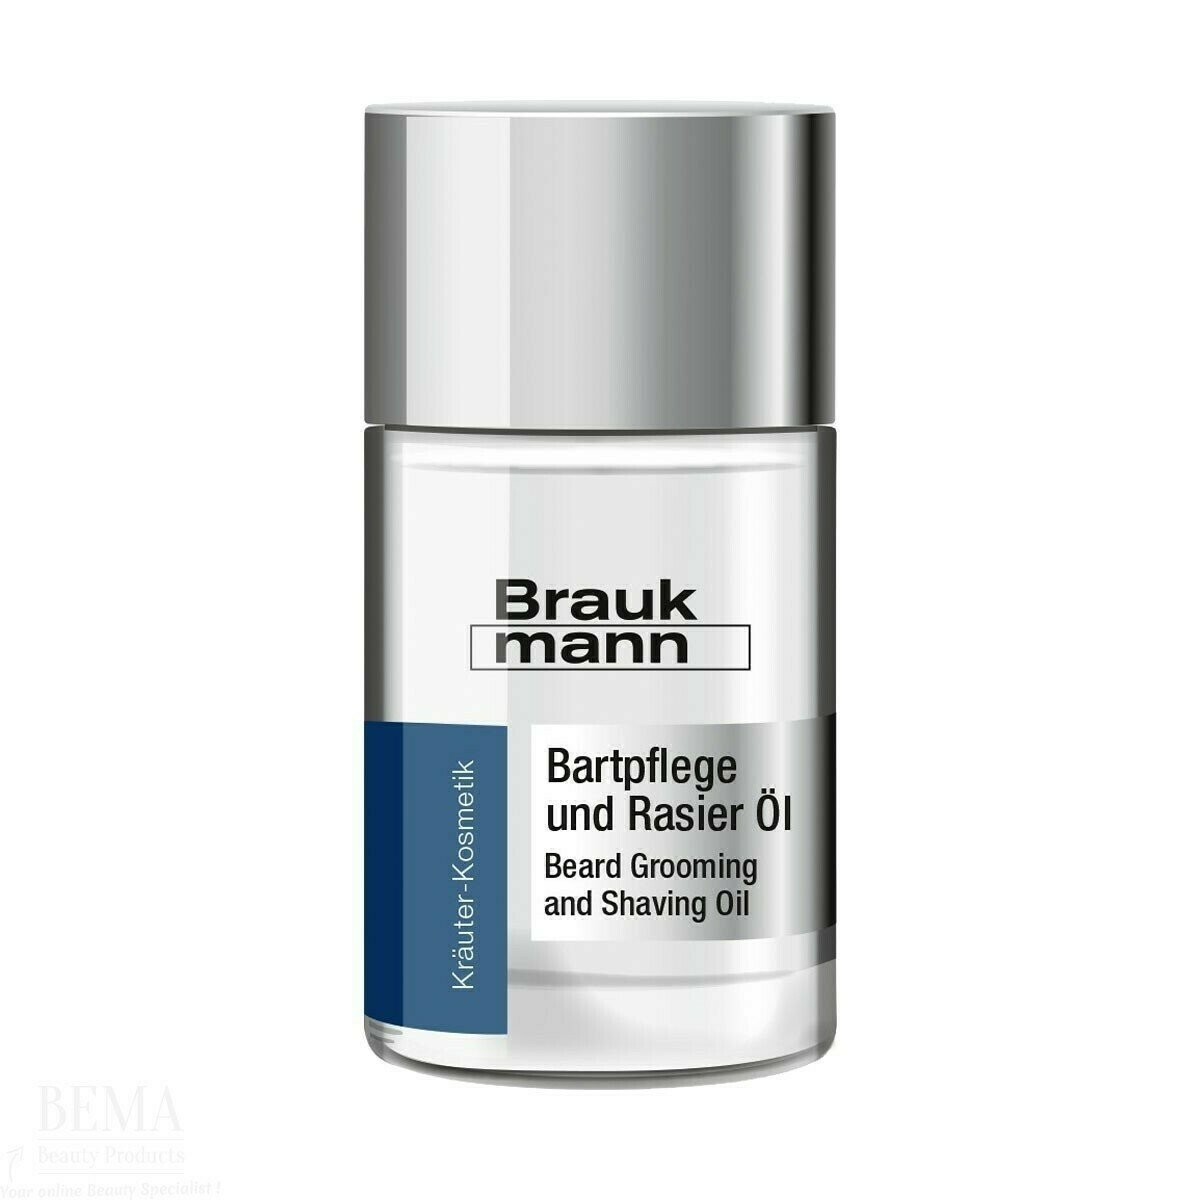 Hildegard Brauckmann Bartpflege und Rasier Öl 30ml